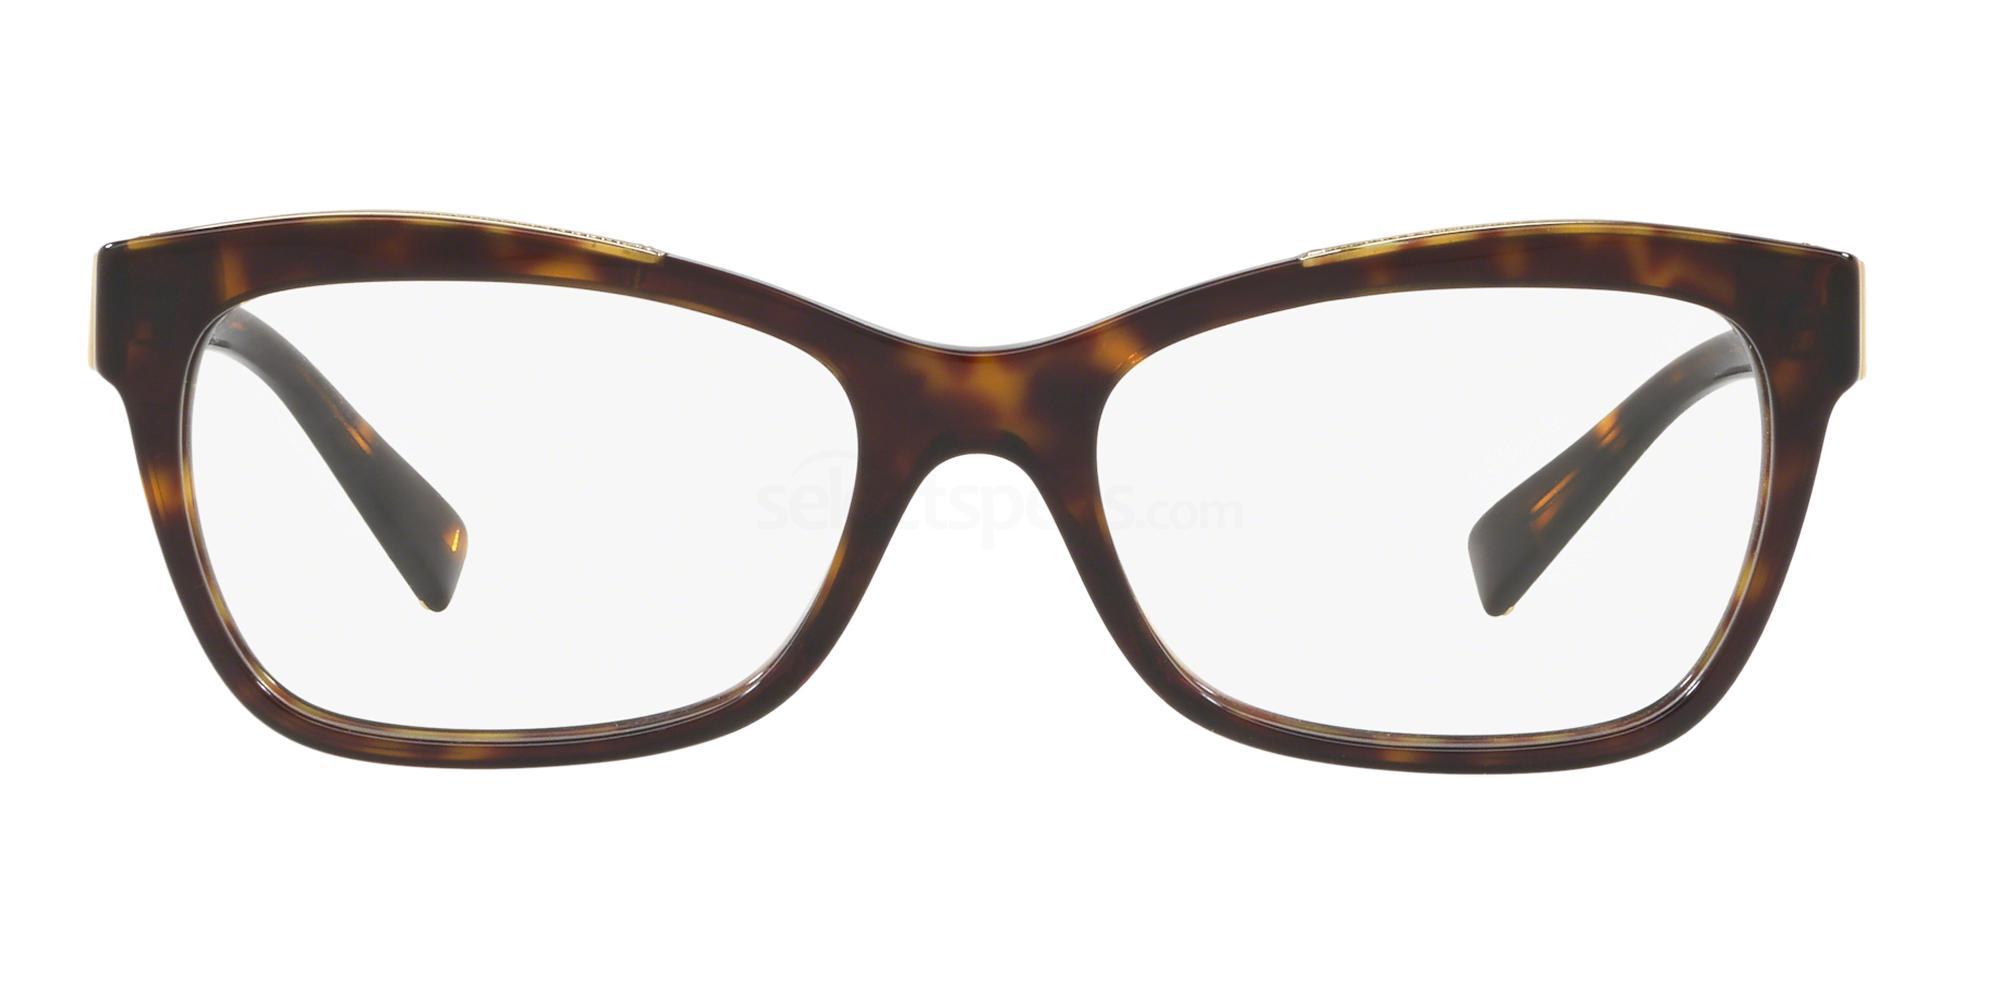 8015 TF2167 Glasses, Tiffany & Co.